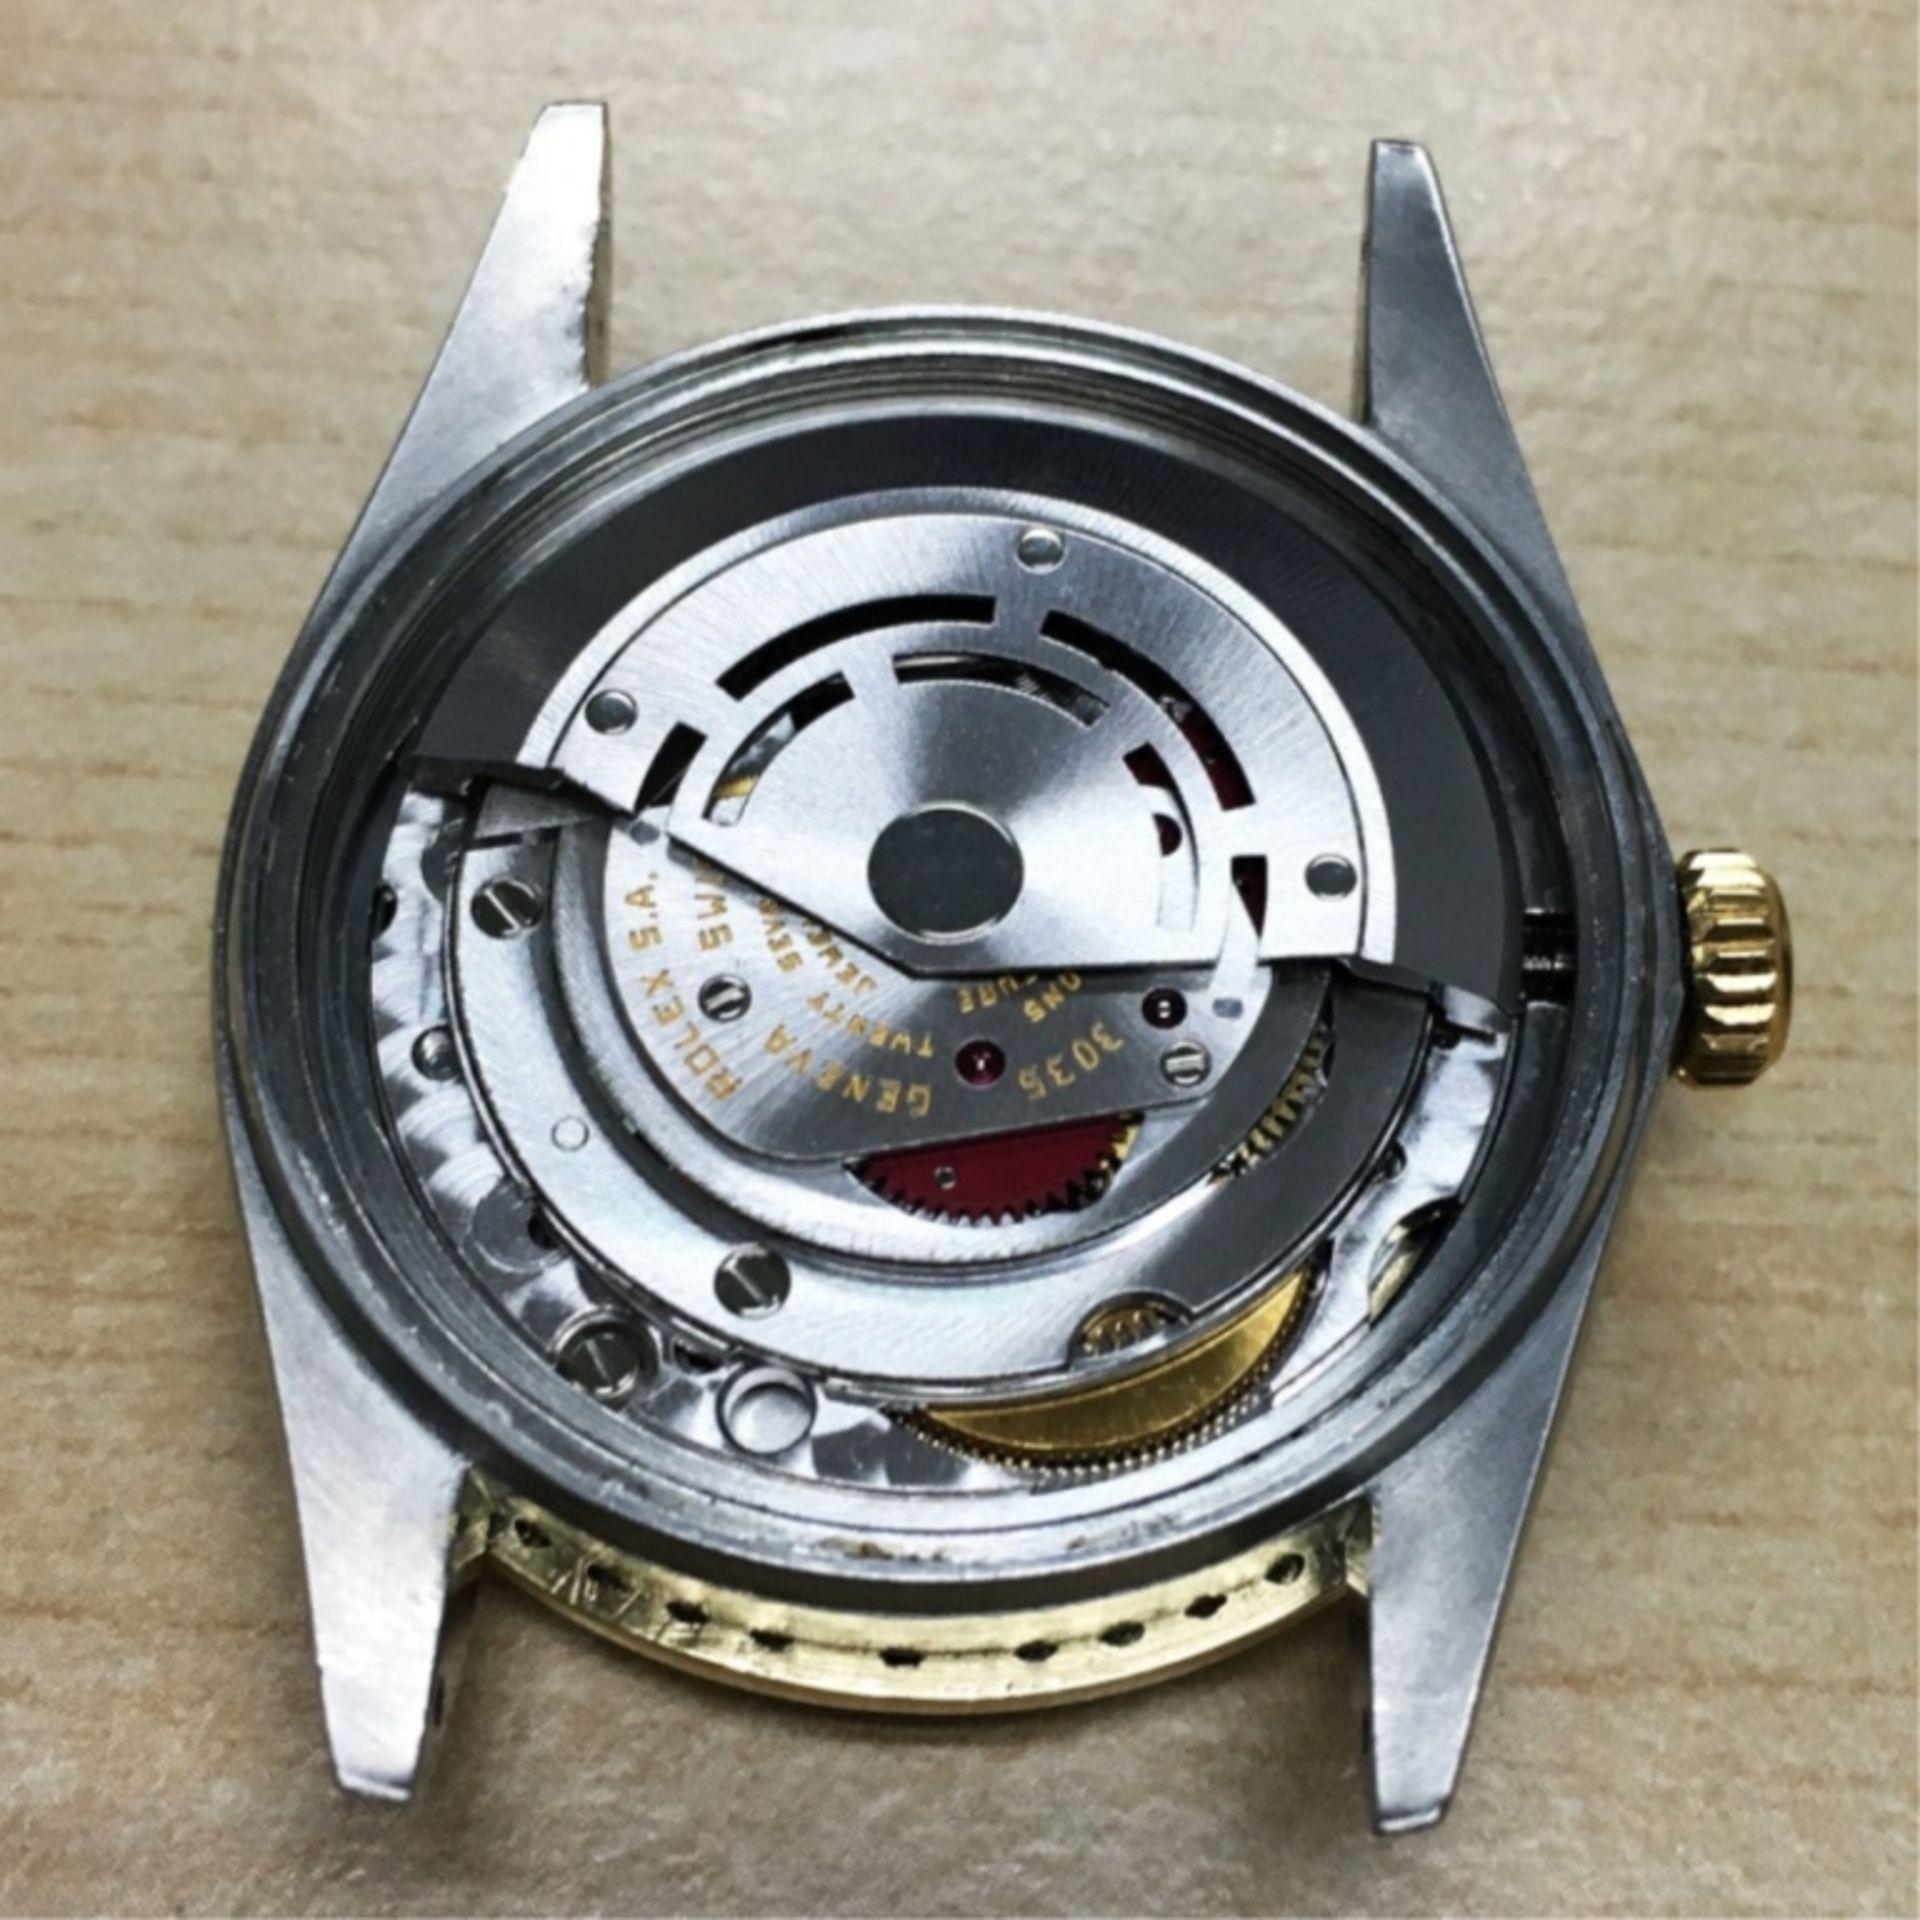 Rolex DateJust 36MM 1.50ct Diamond Wristwatch - Image 3 of 7